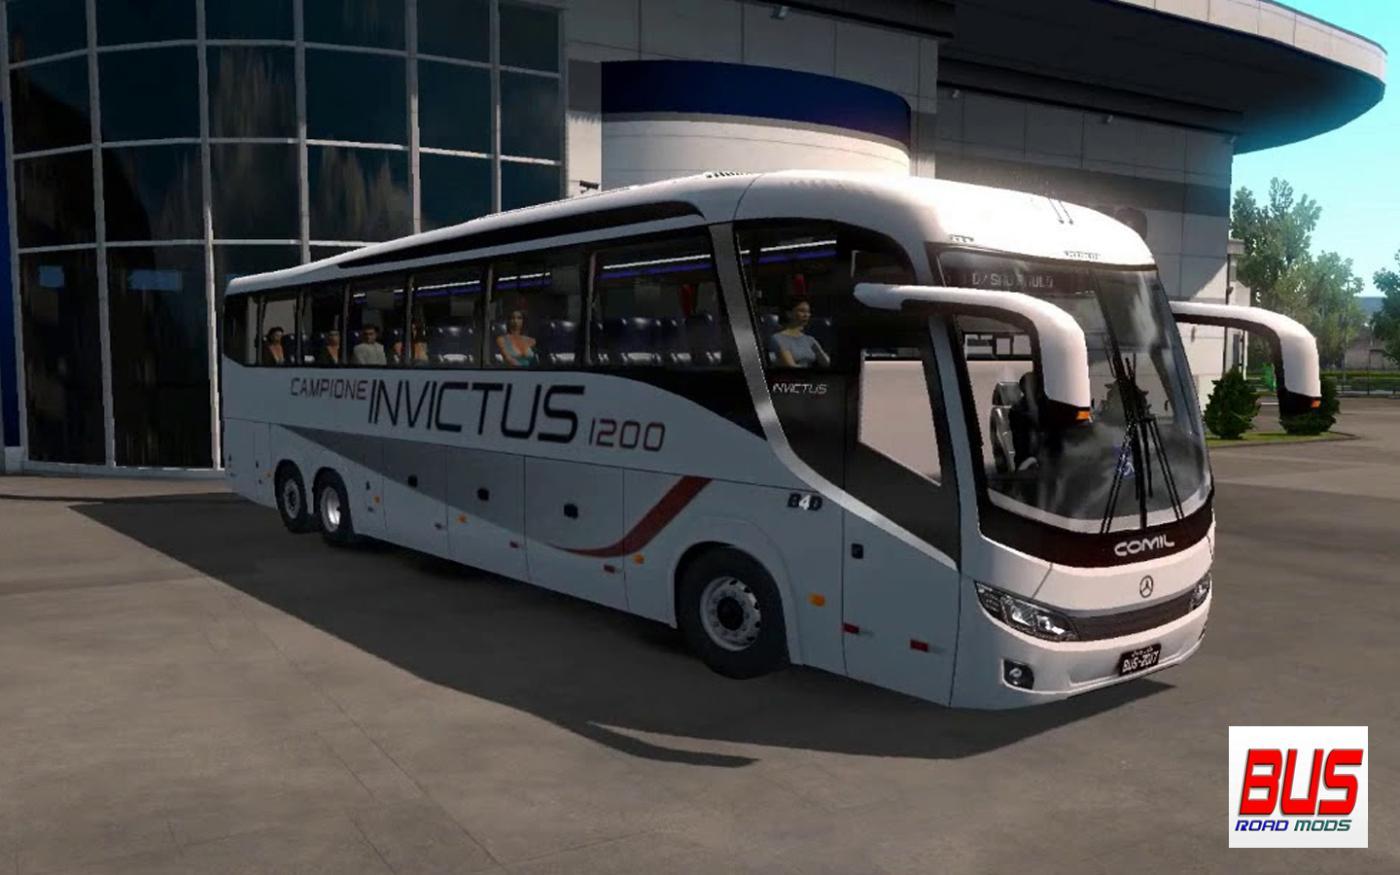 COMIL INVICTUS 1200 MB 1 34 BUS MOD -Euro Truck Simulator 2 Mods